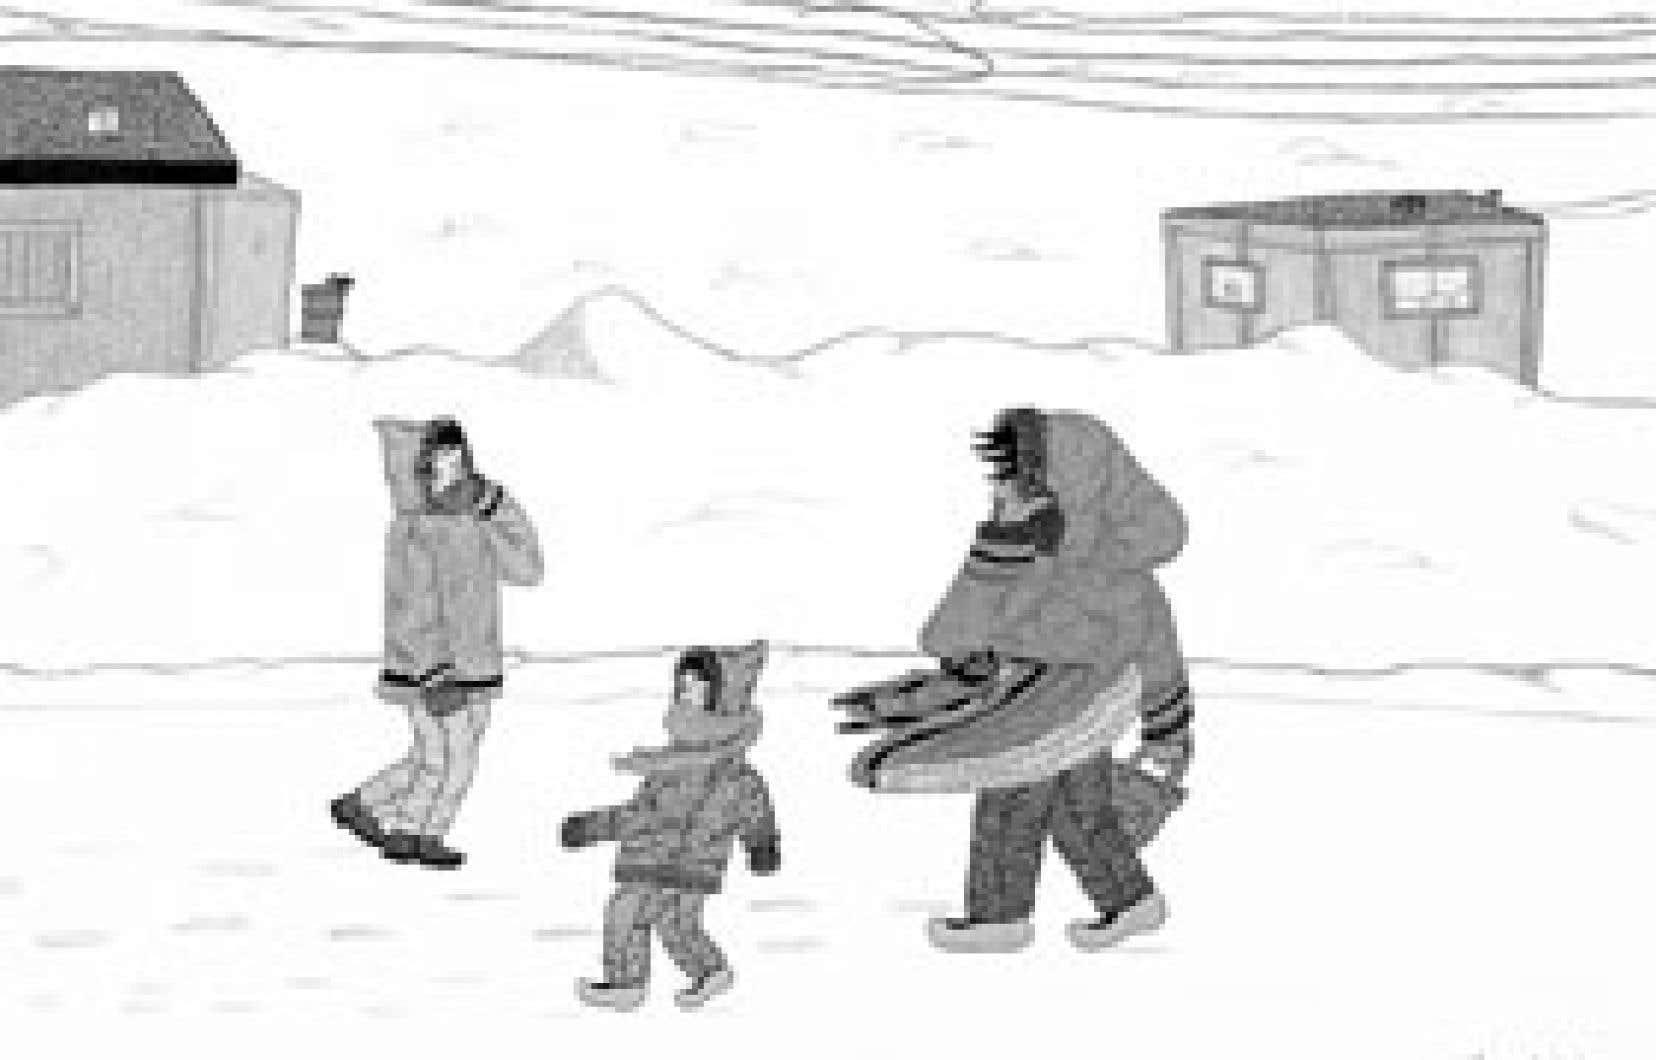 Annie Pootoogook, Composition (Windy Day), 2006 Source: collection de John et Joyce Price, seattle